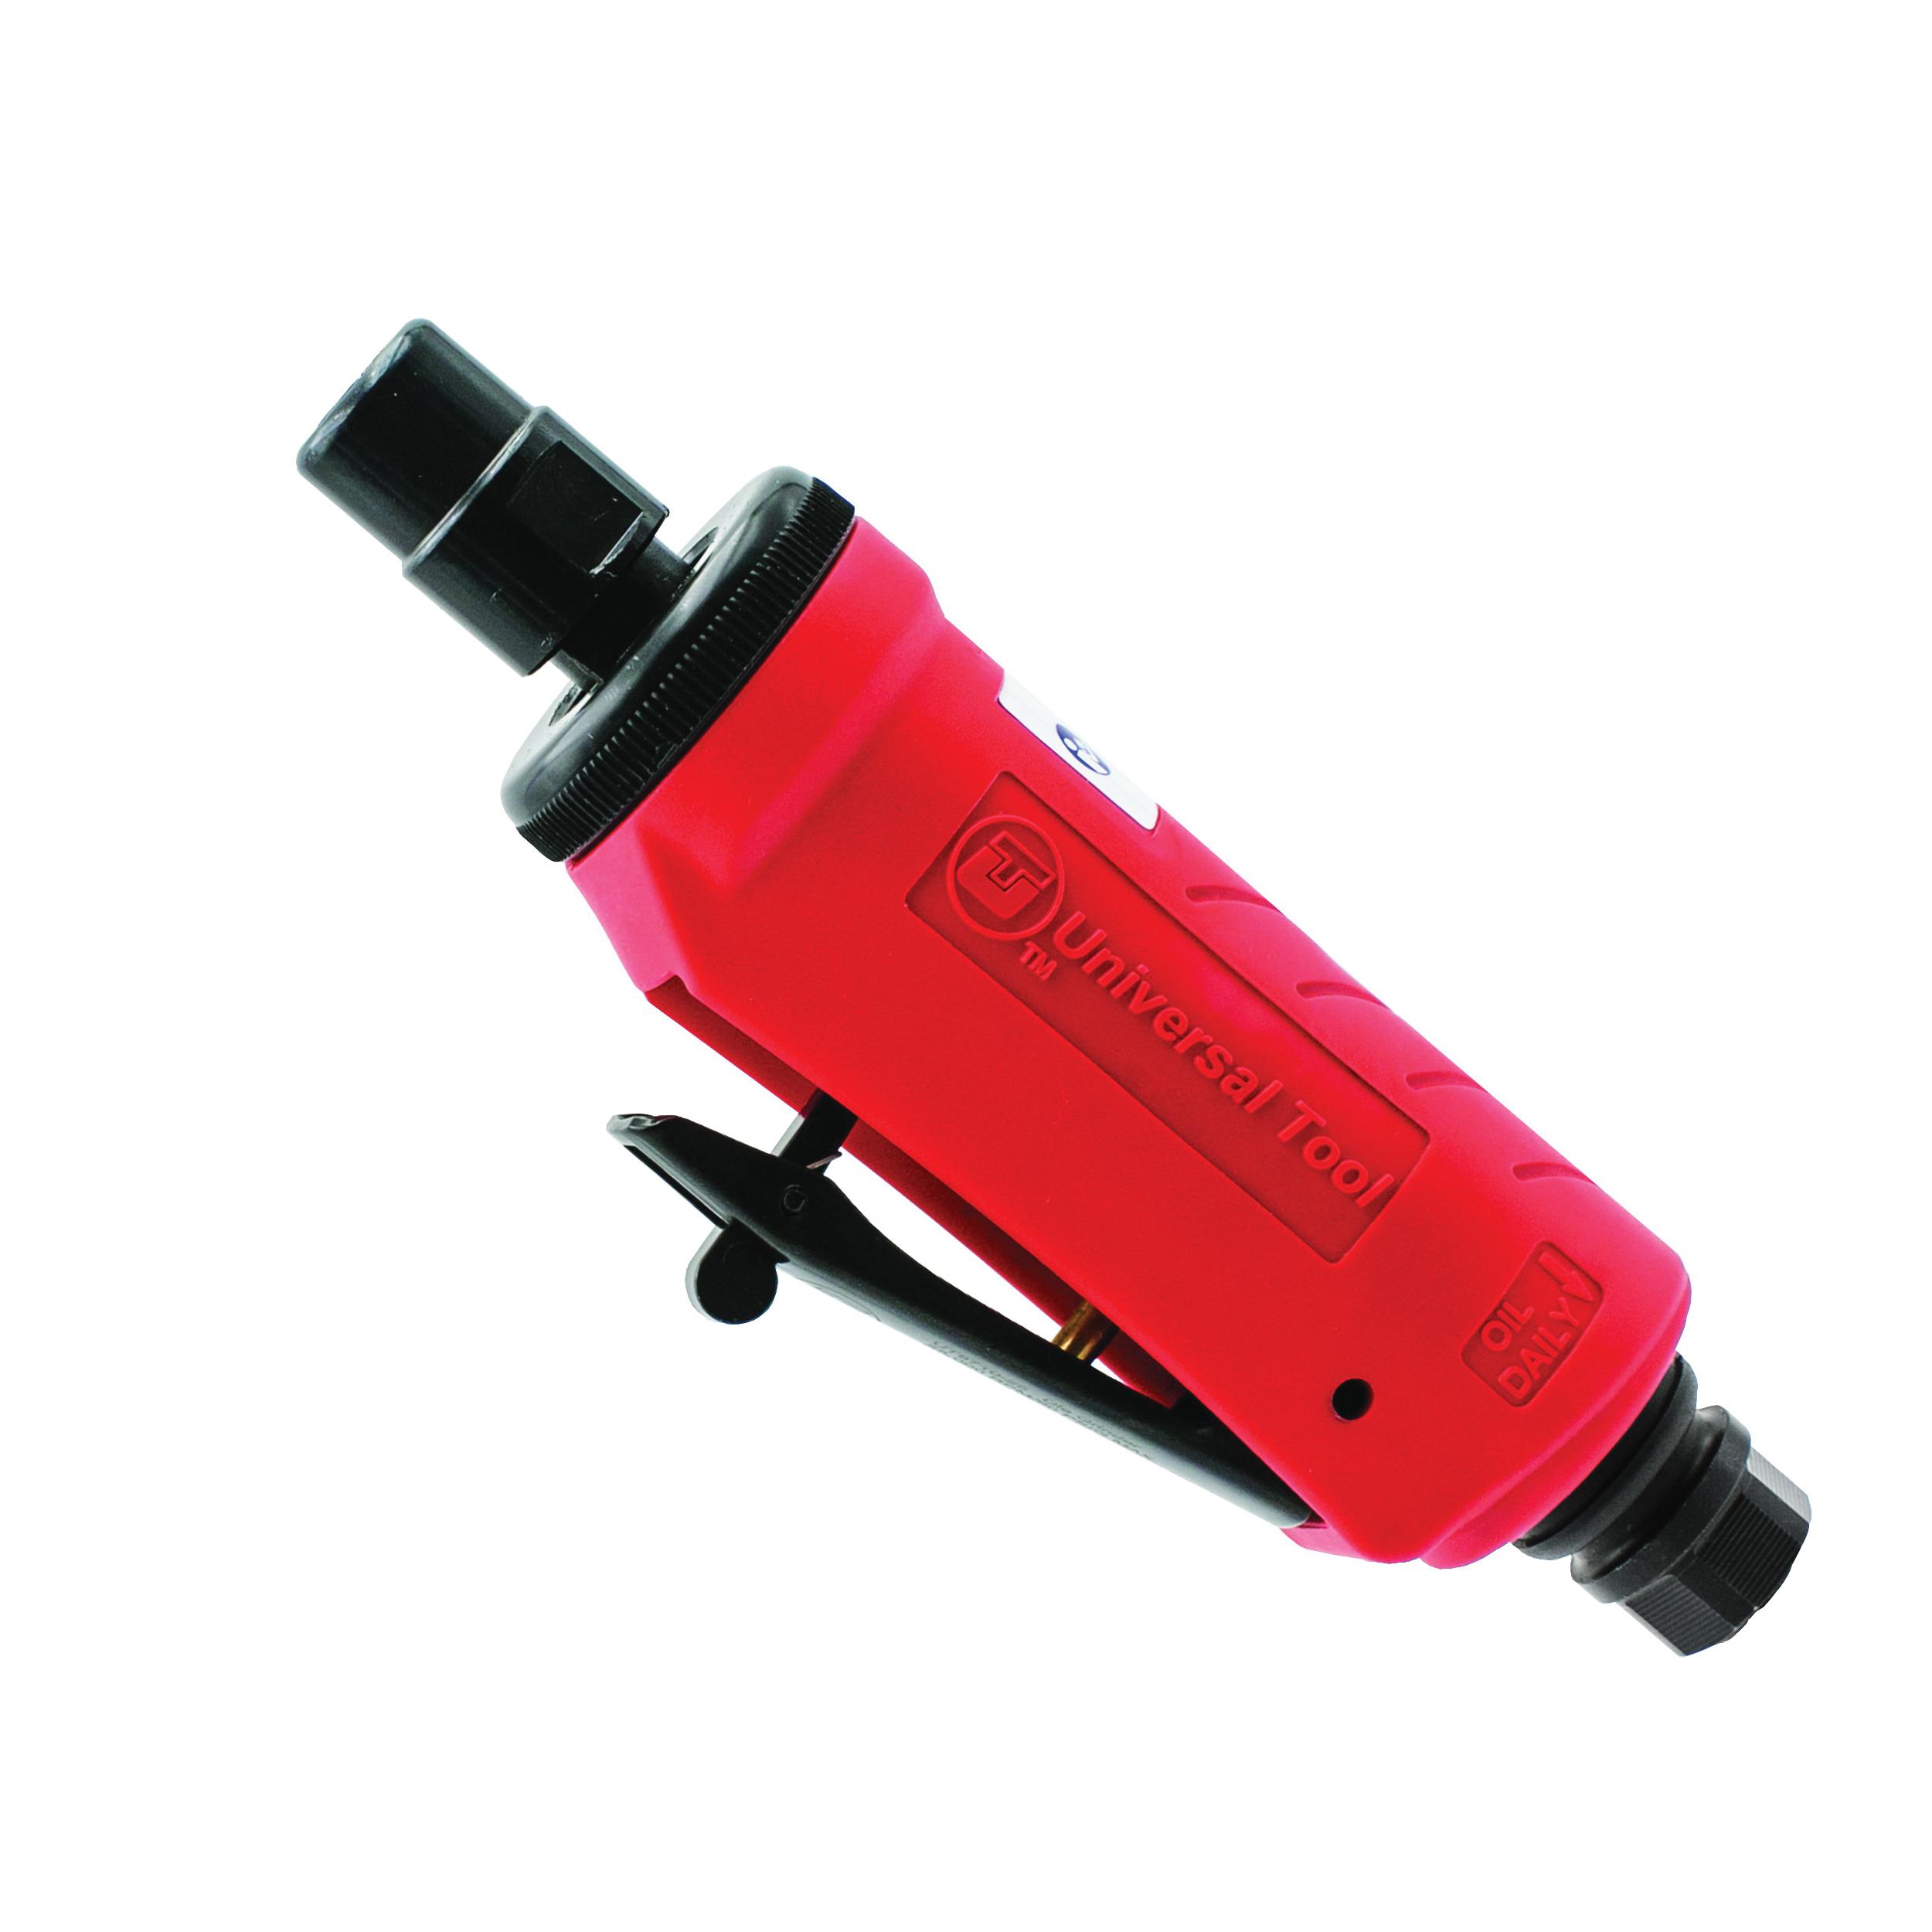 UT™ UT4425-1 Straight Pneumatic Die Grinder, 1/4 in Collet, For Max Wheel Dia: 2 in, 1 hp, 5.5 cfm Air Flow, 90 psi, 25000 rpm Speed